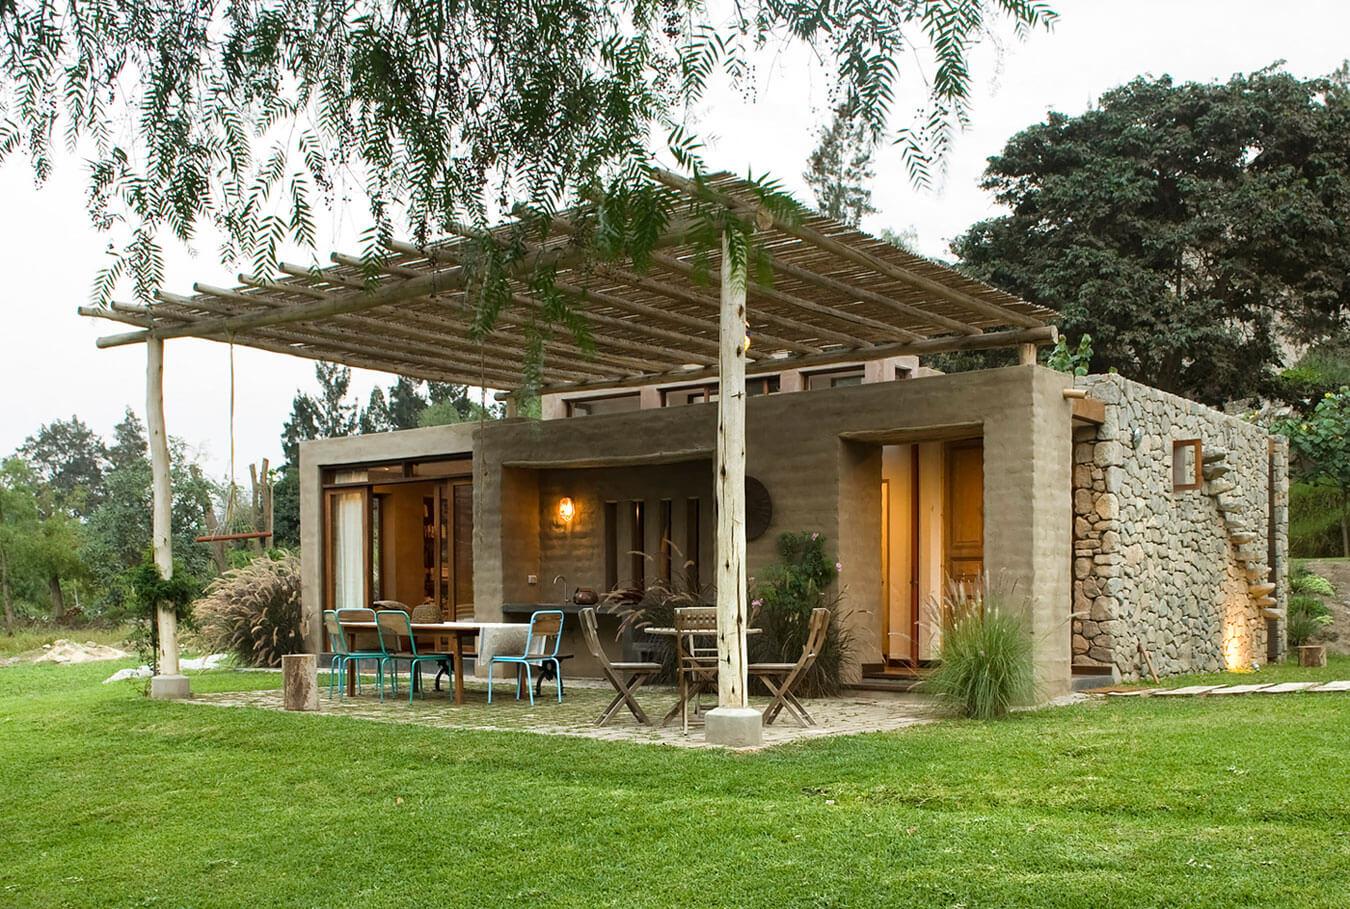 Casa chontay by marina vella arquitectos homeadore for Arquitectura minimalista casas